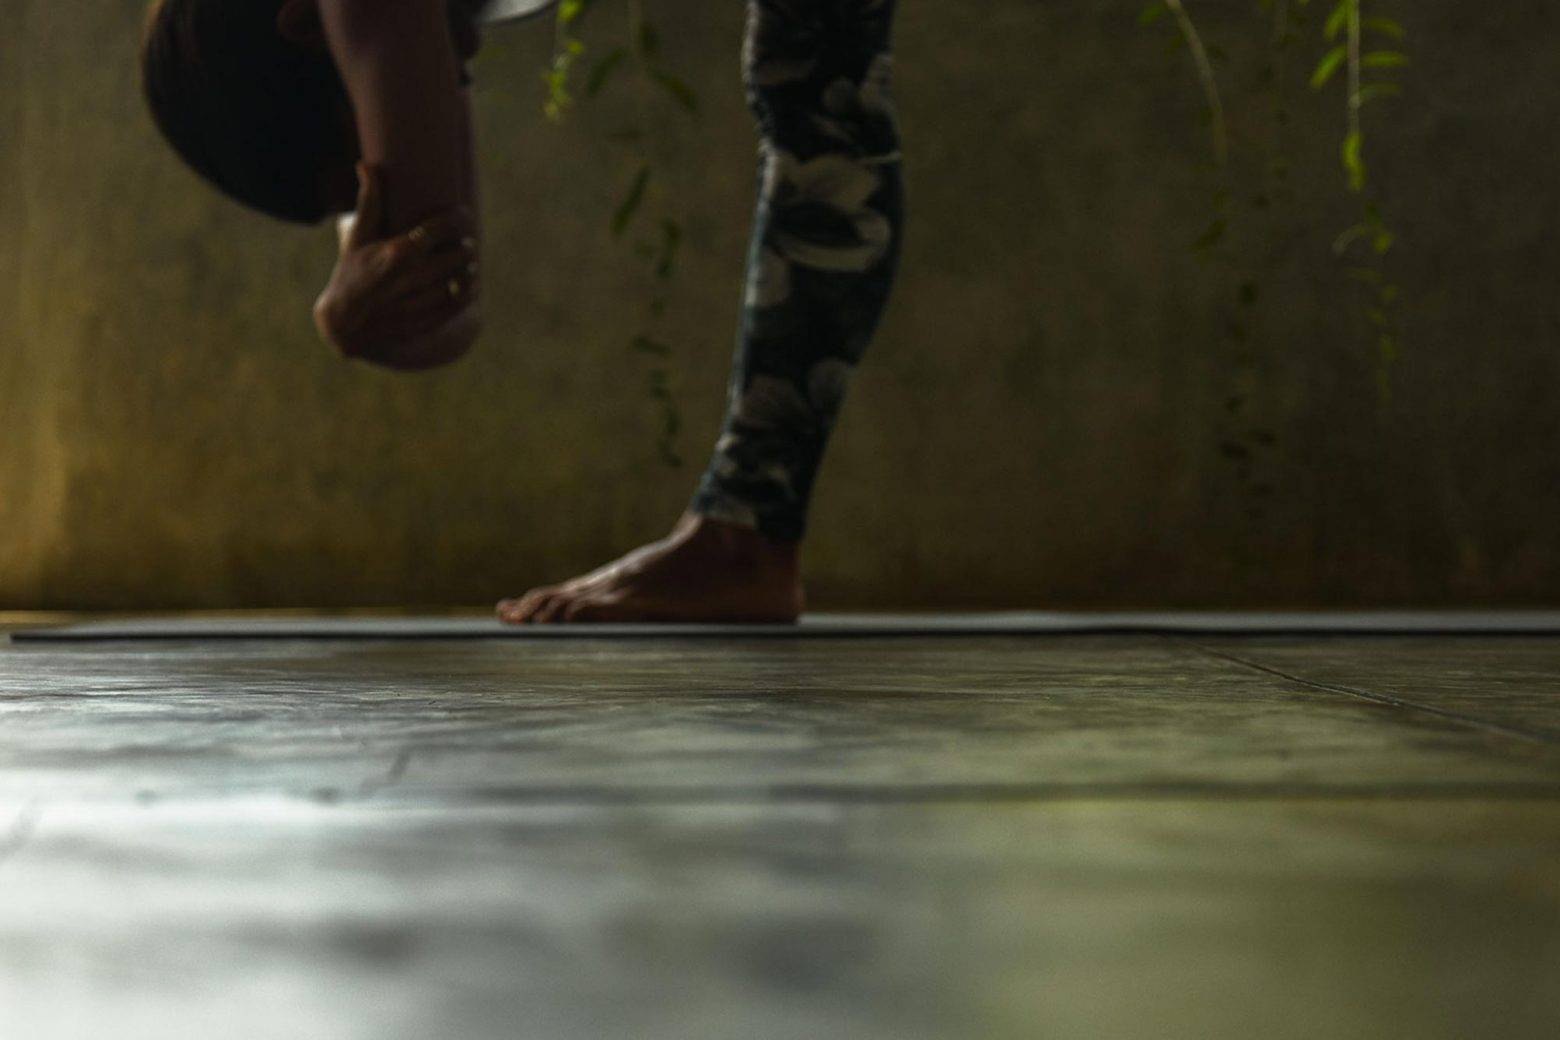 https://www.soulandsurf.com/wp-content/uploads/2021/07/Yoga-Lanka-1-e1627733662917.jpg Image